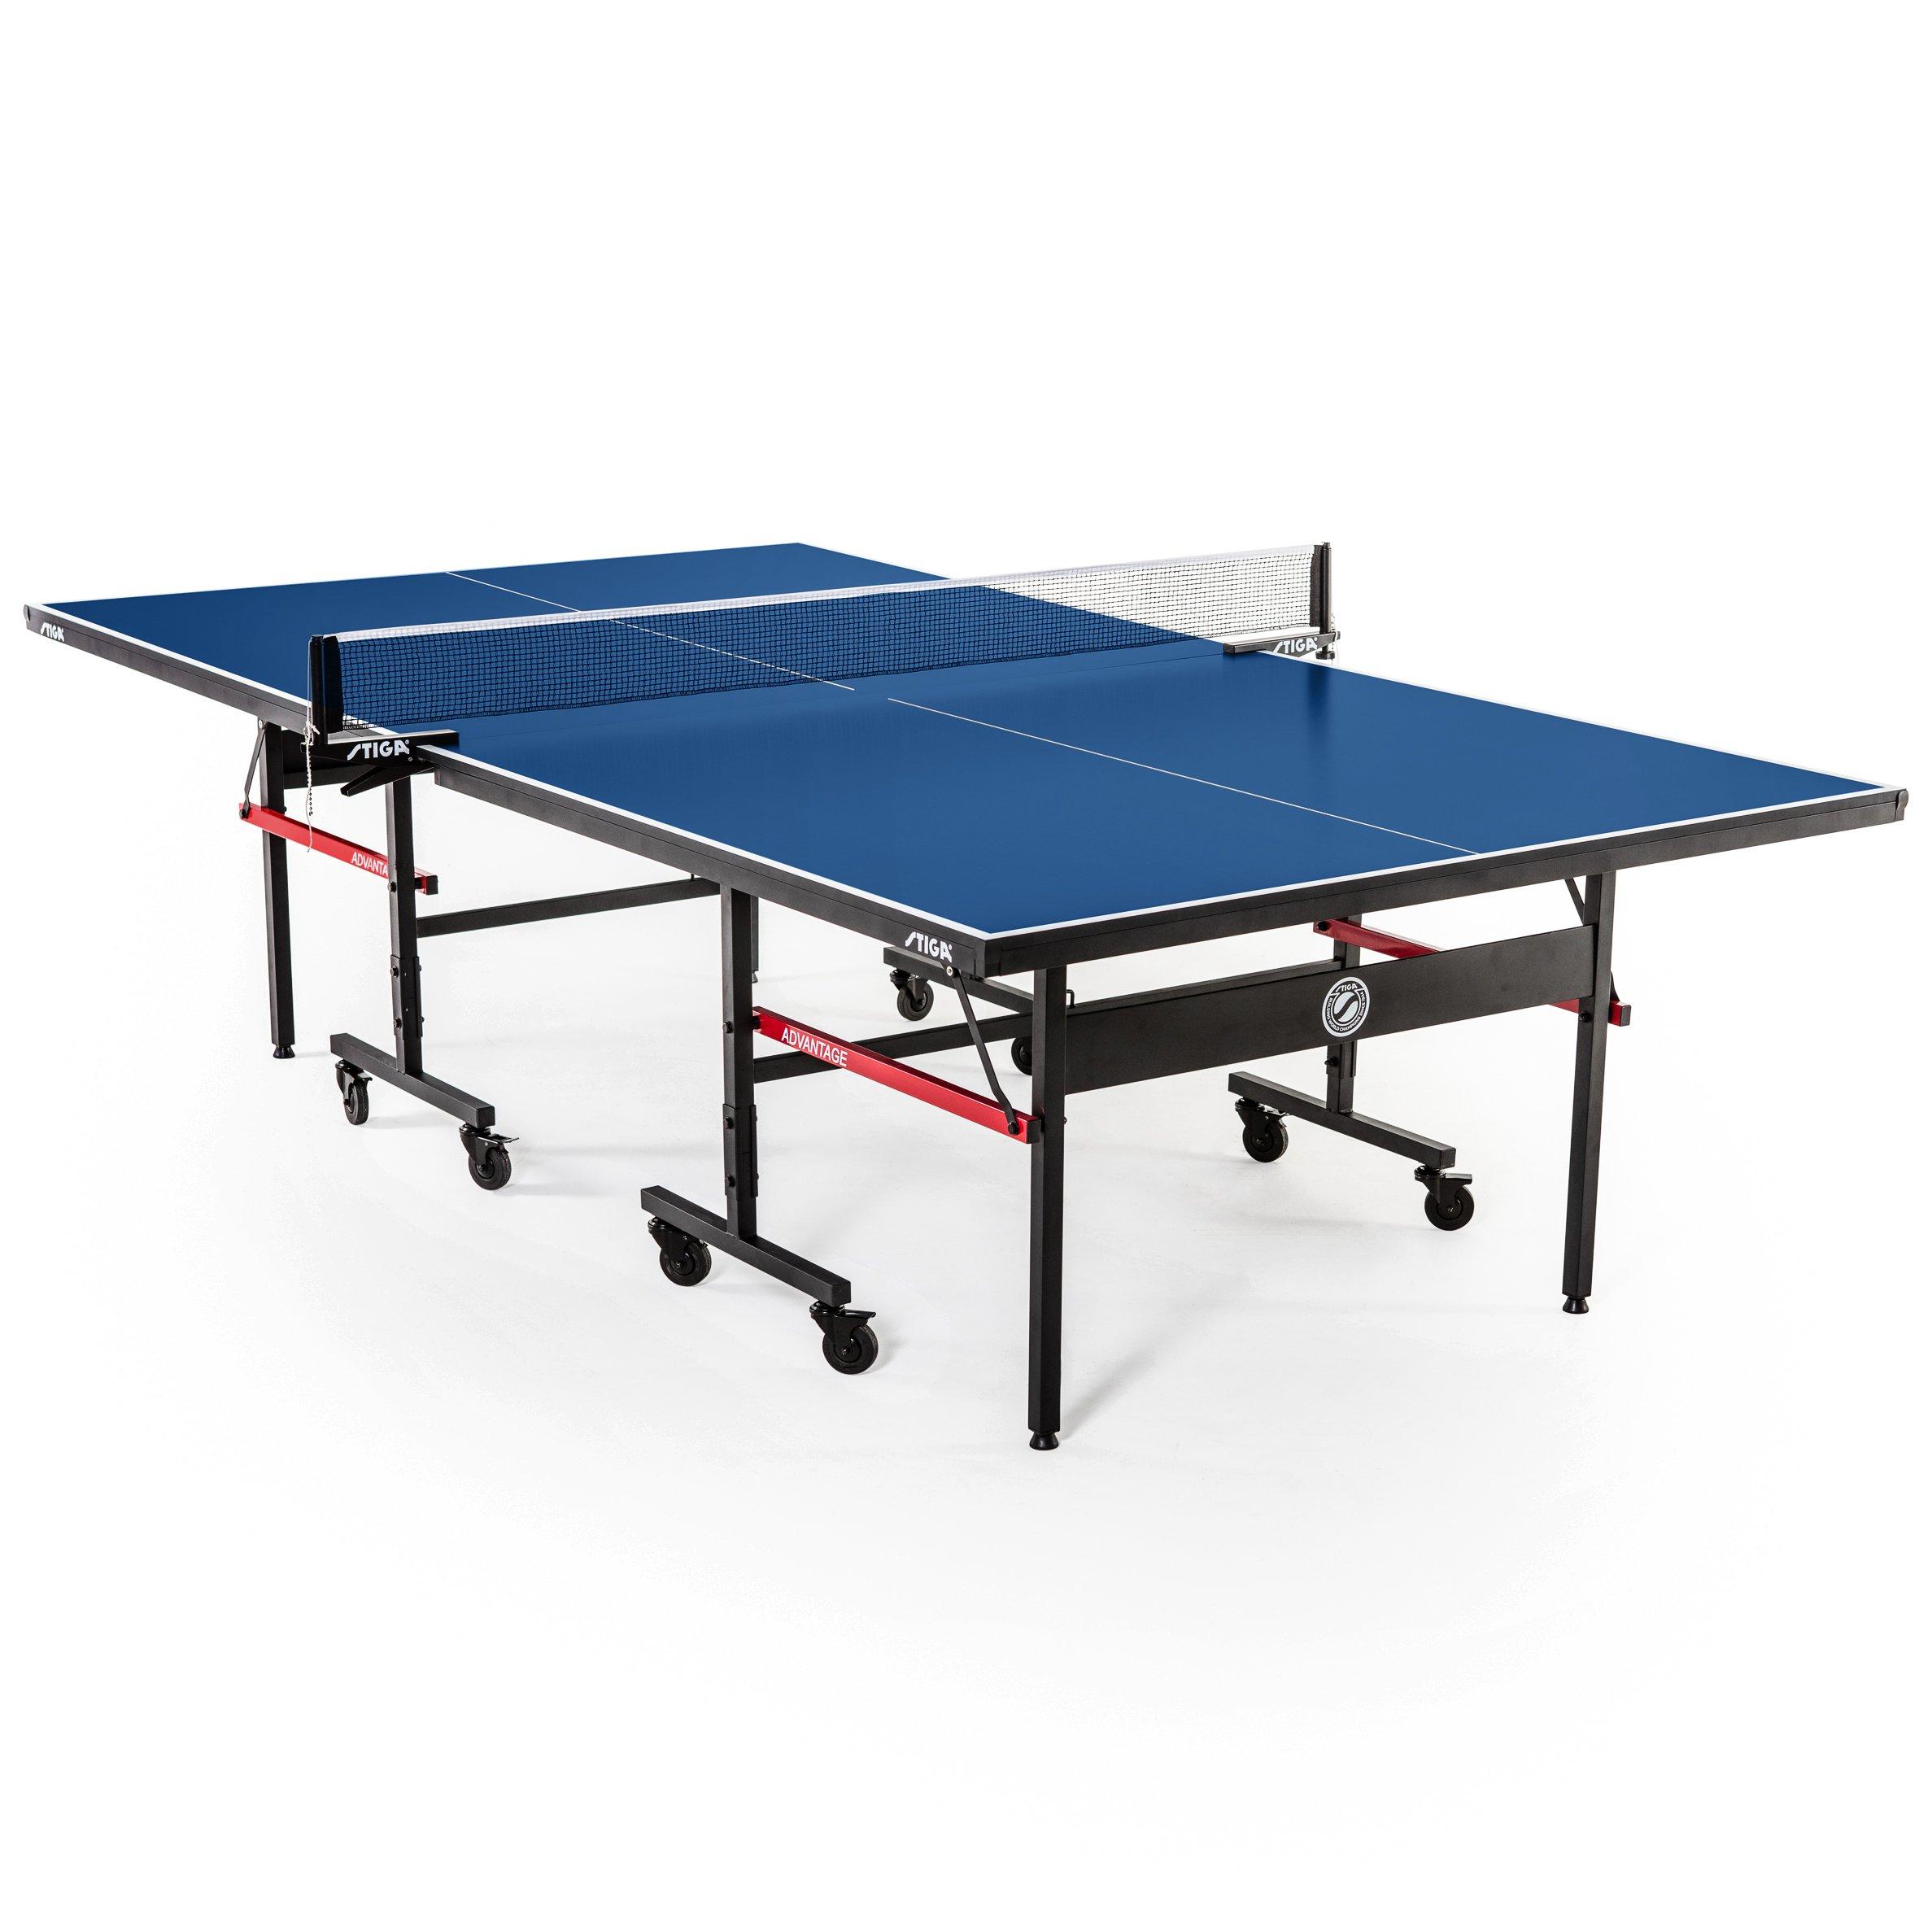 STIGA Advantage Table Tennis Table by STIGA